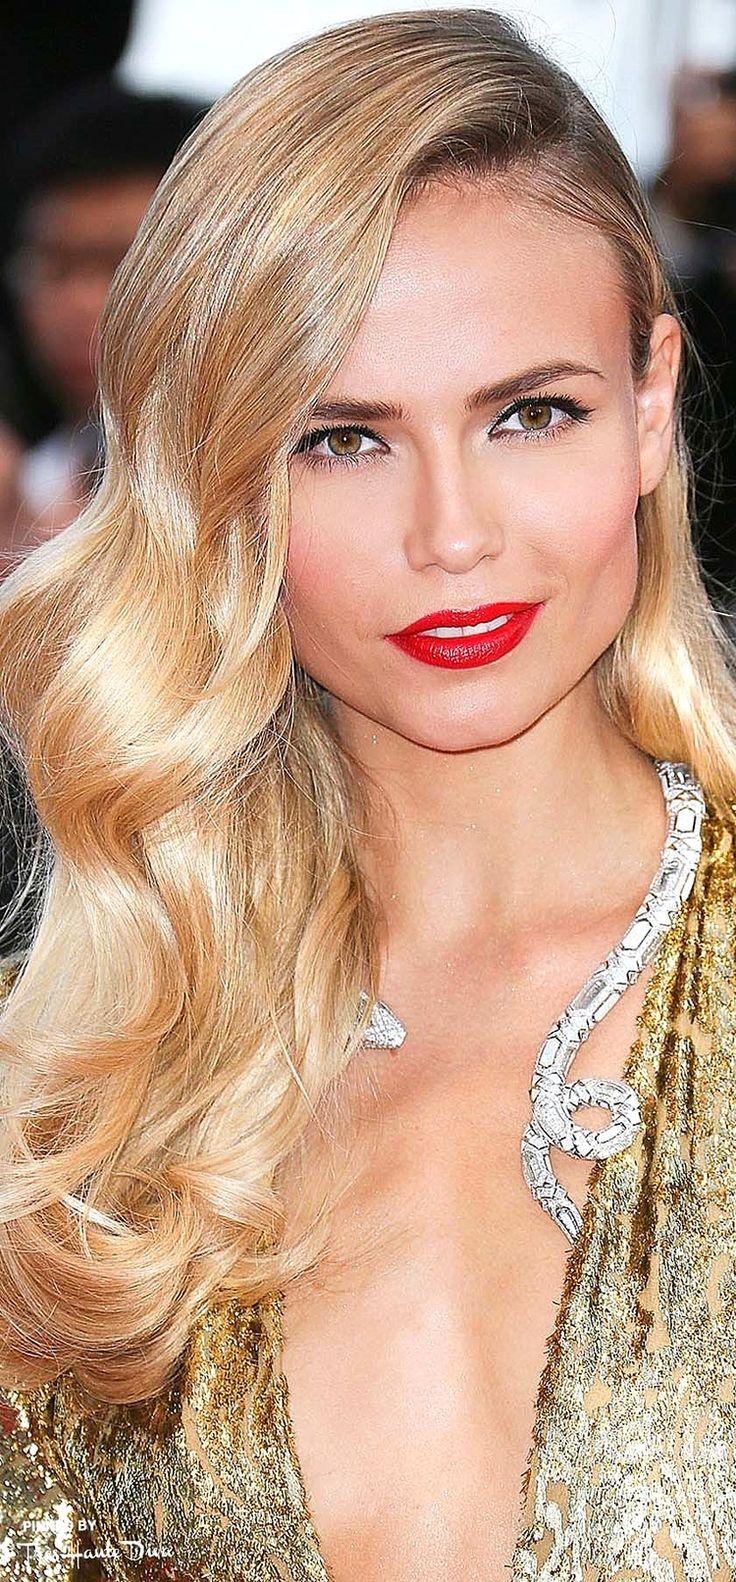 #Natasha #Poly  ♔ Cannes Film Festival 2015 Red Carpet ♔ Très Haute Diva ♔